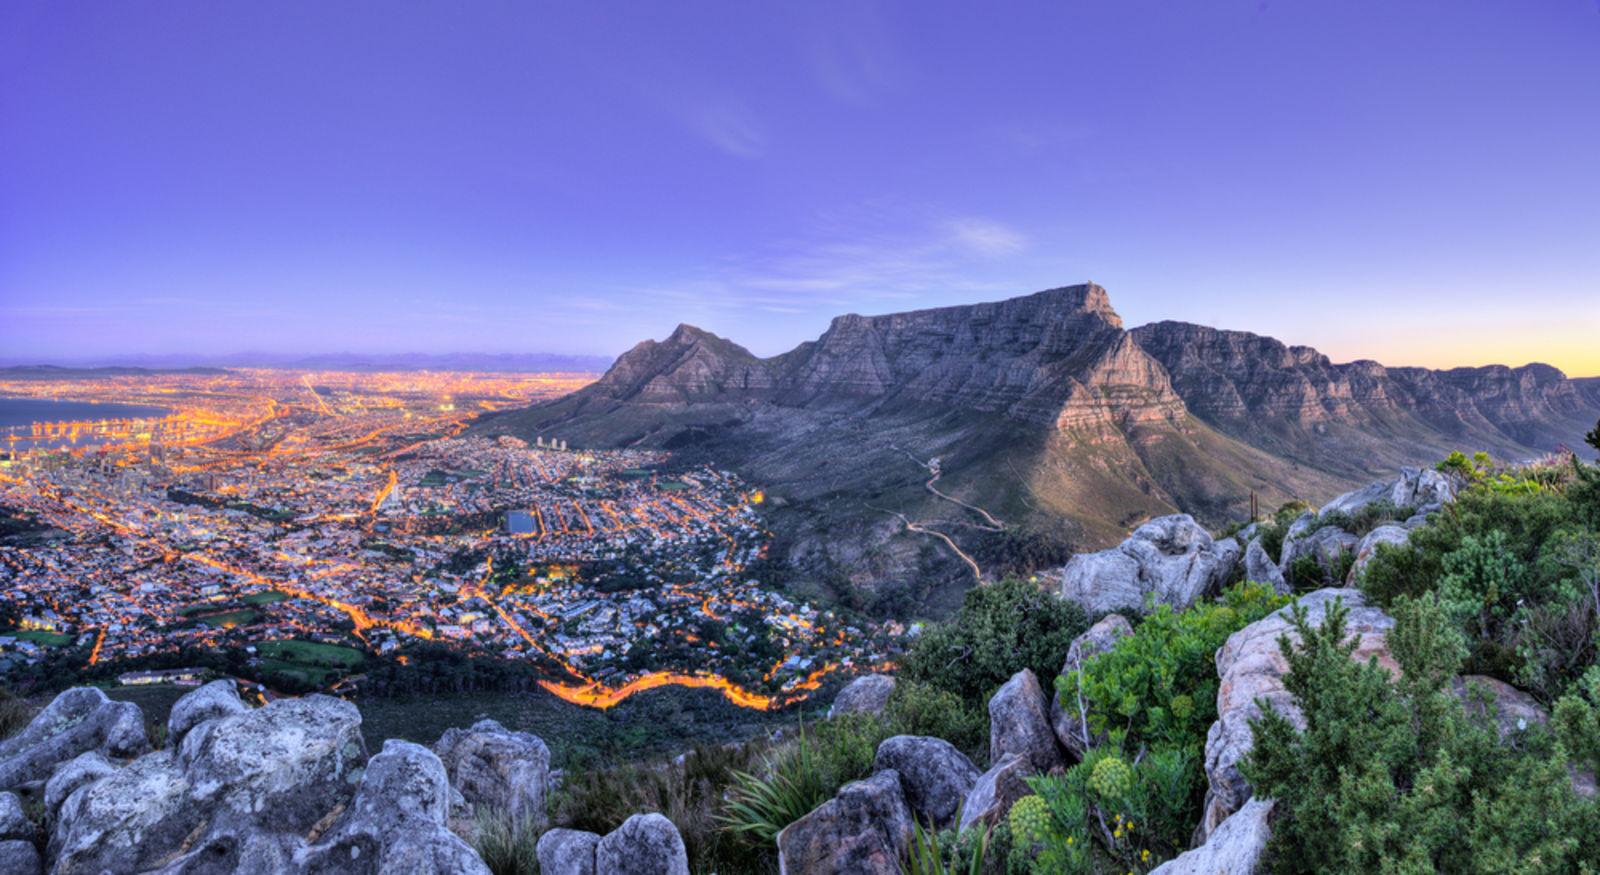 Sonnenuntergang am Tafelberg in Kapstadt, Südafrika